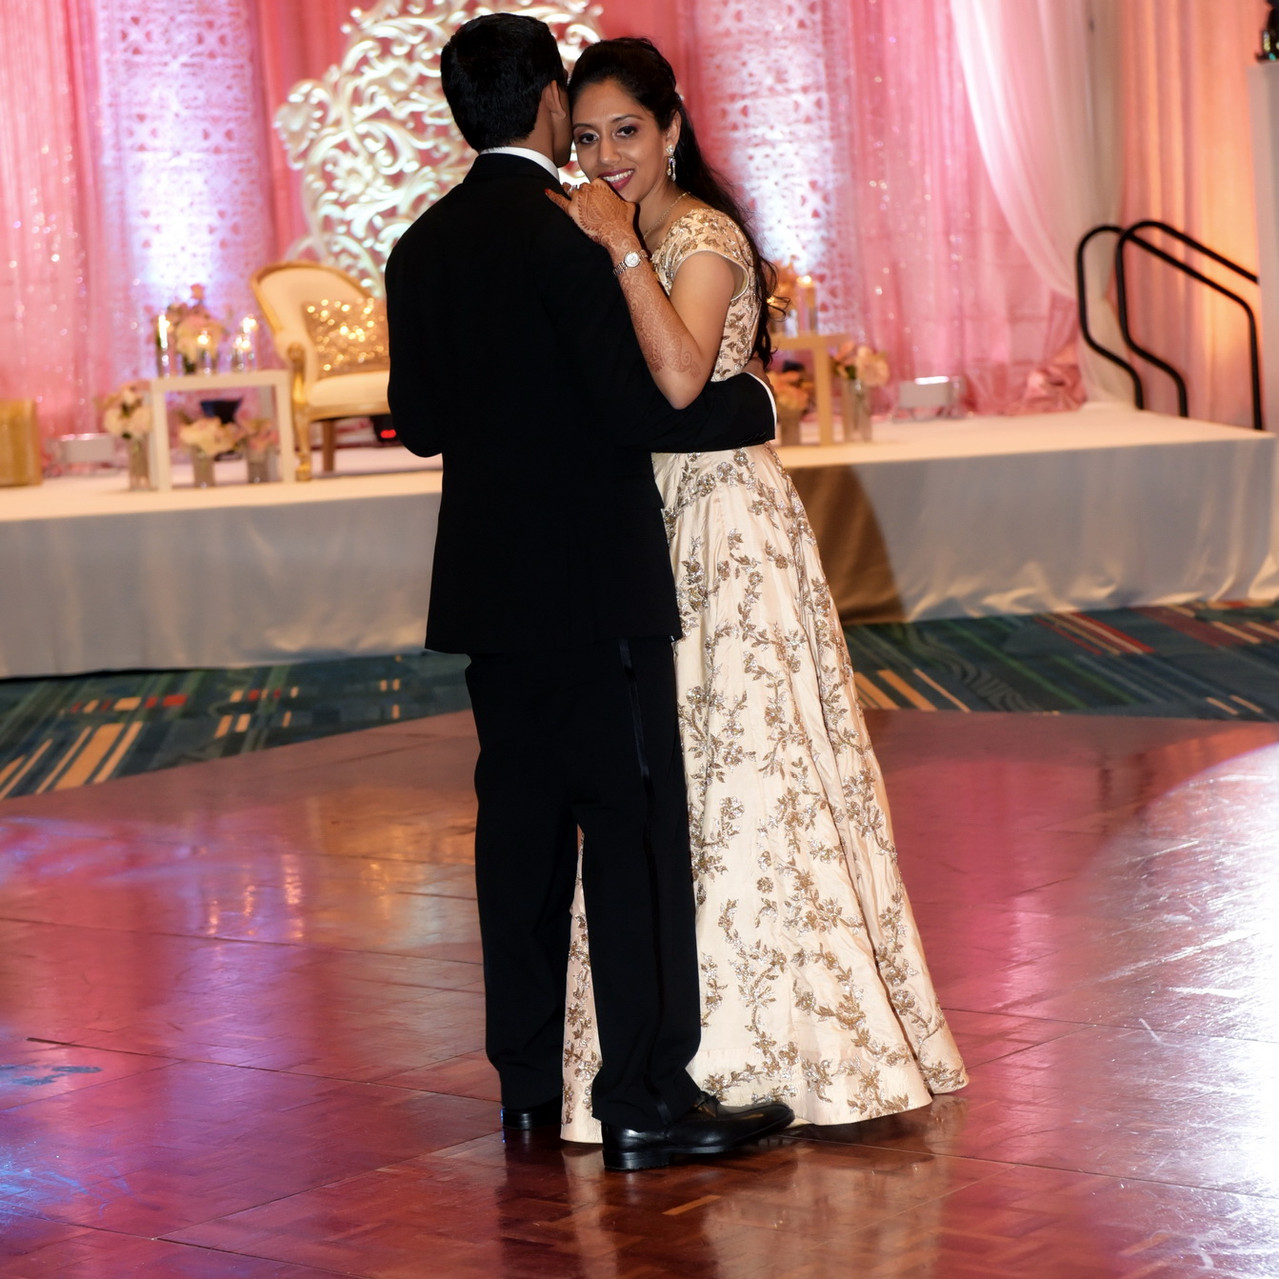 Hyatt-Regency-Grand-Cypress-Indian-Wedding-Reception-Photography-Fine-Art-Production-Amish-Thakkar_21